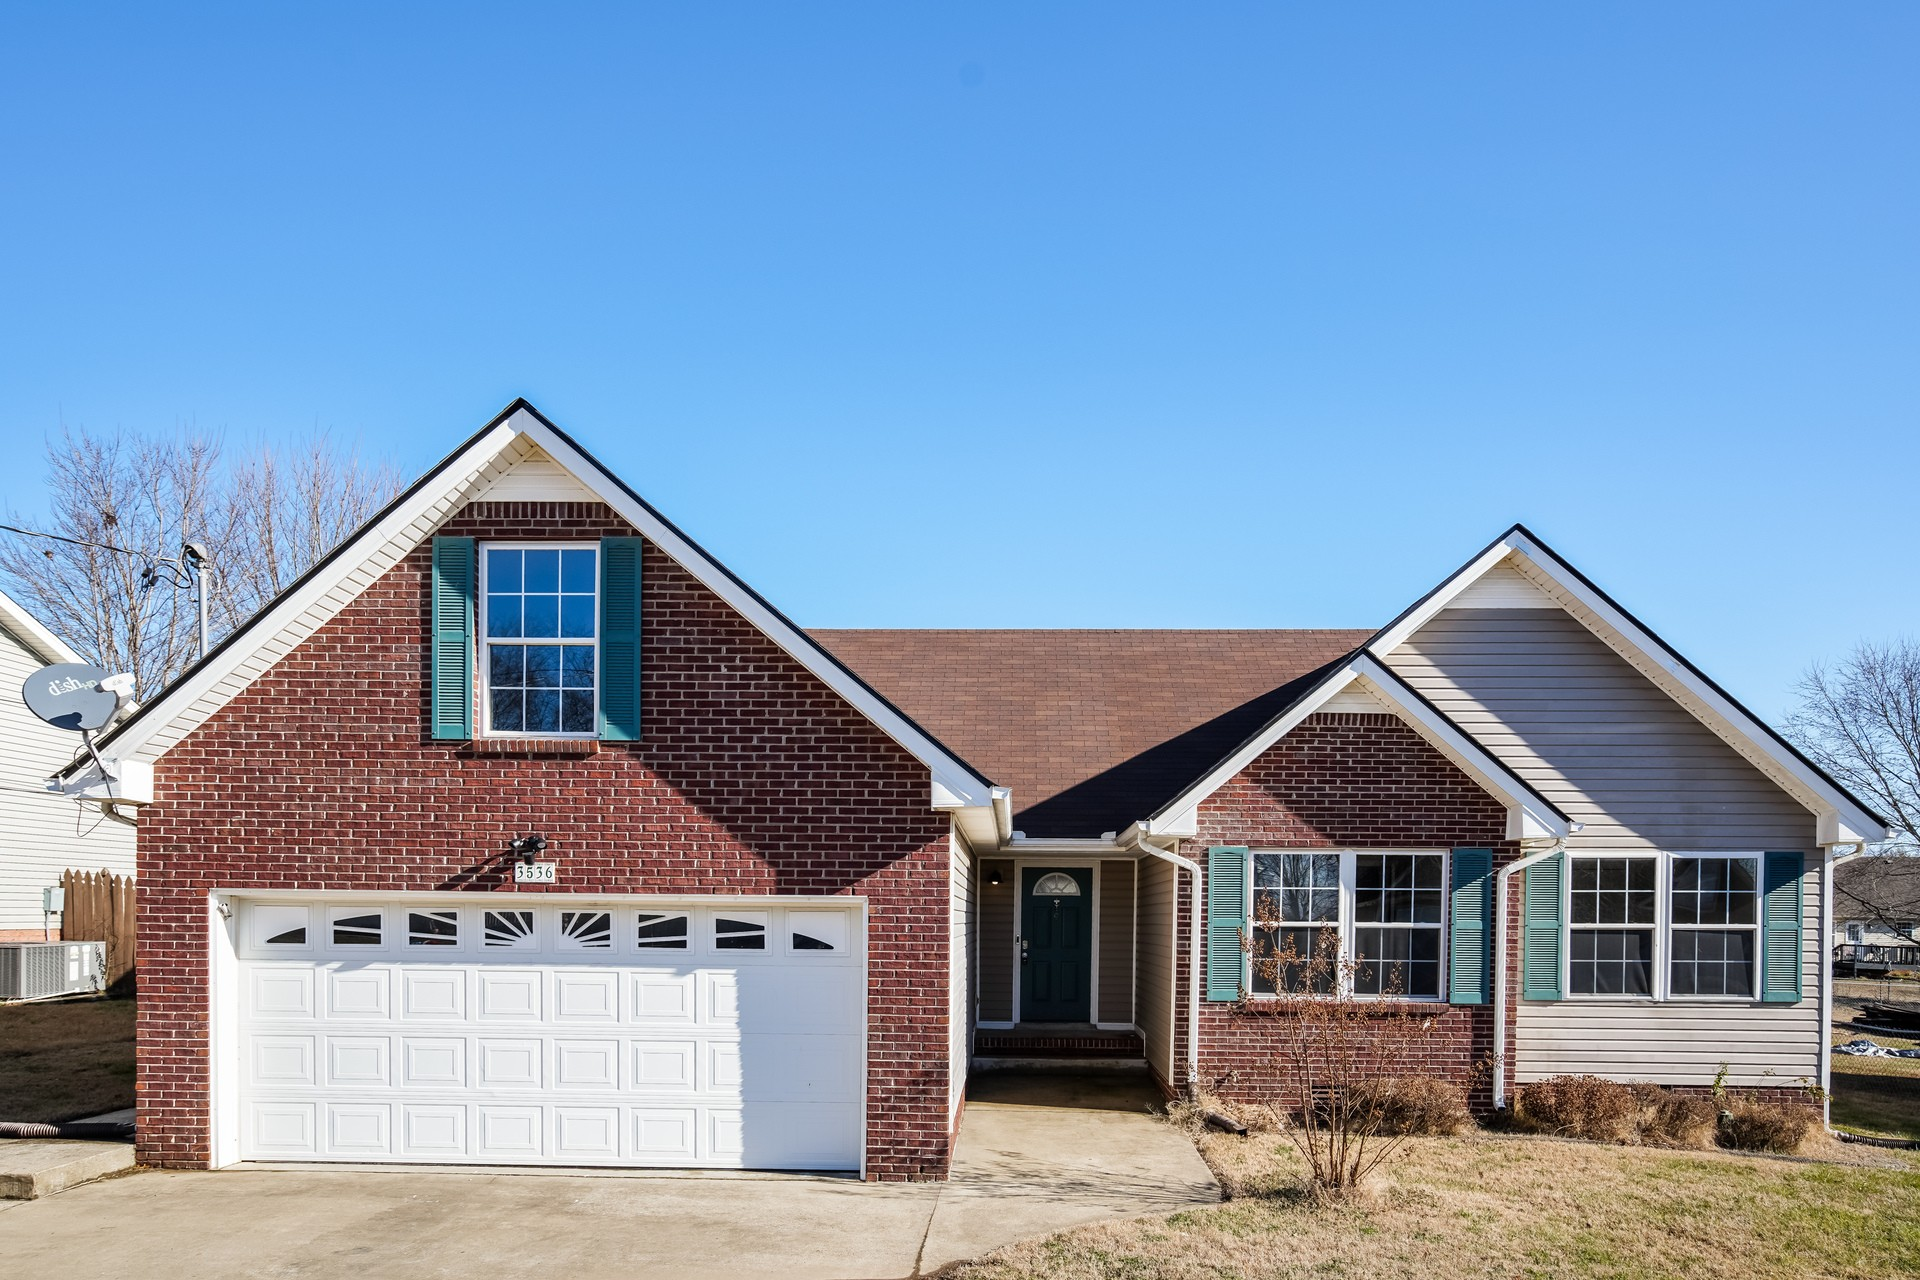 3536 Sandpiper Dr Property Photo - Clarksville, TN real estate listing